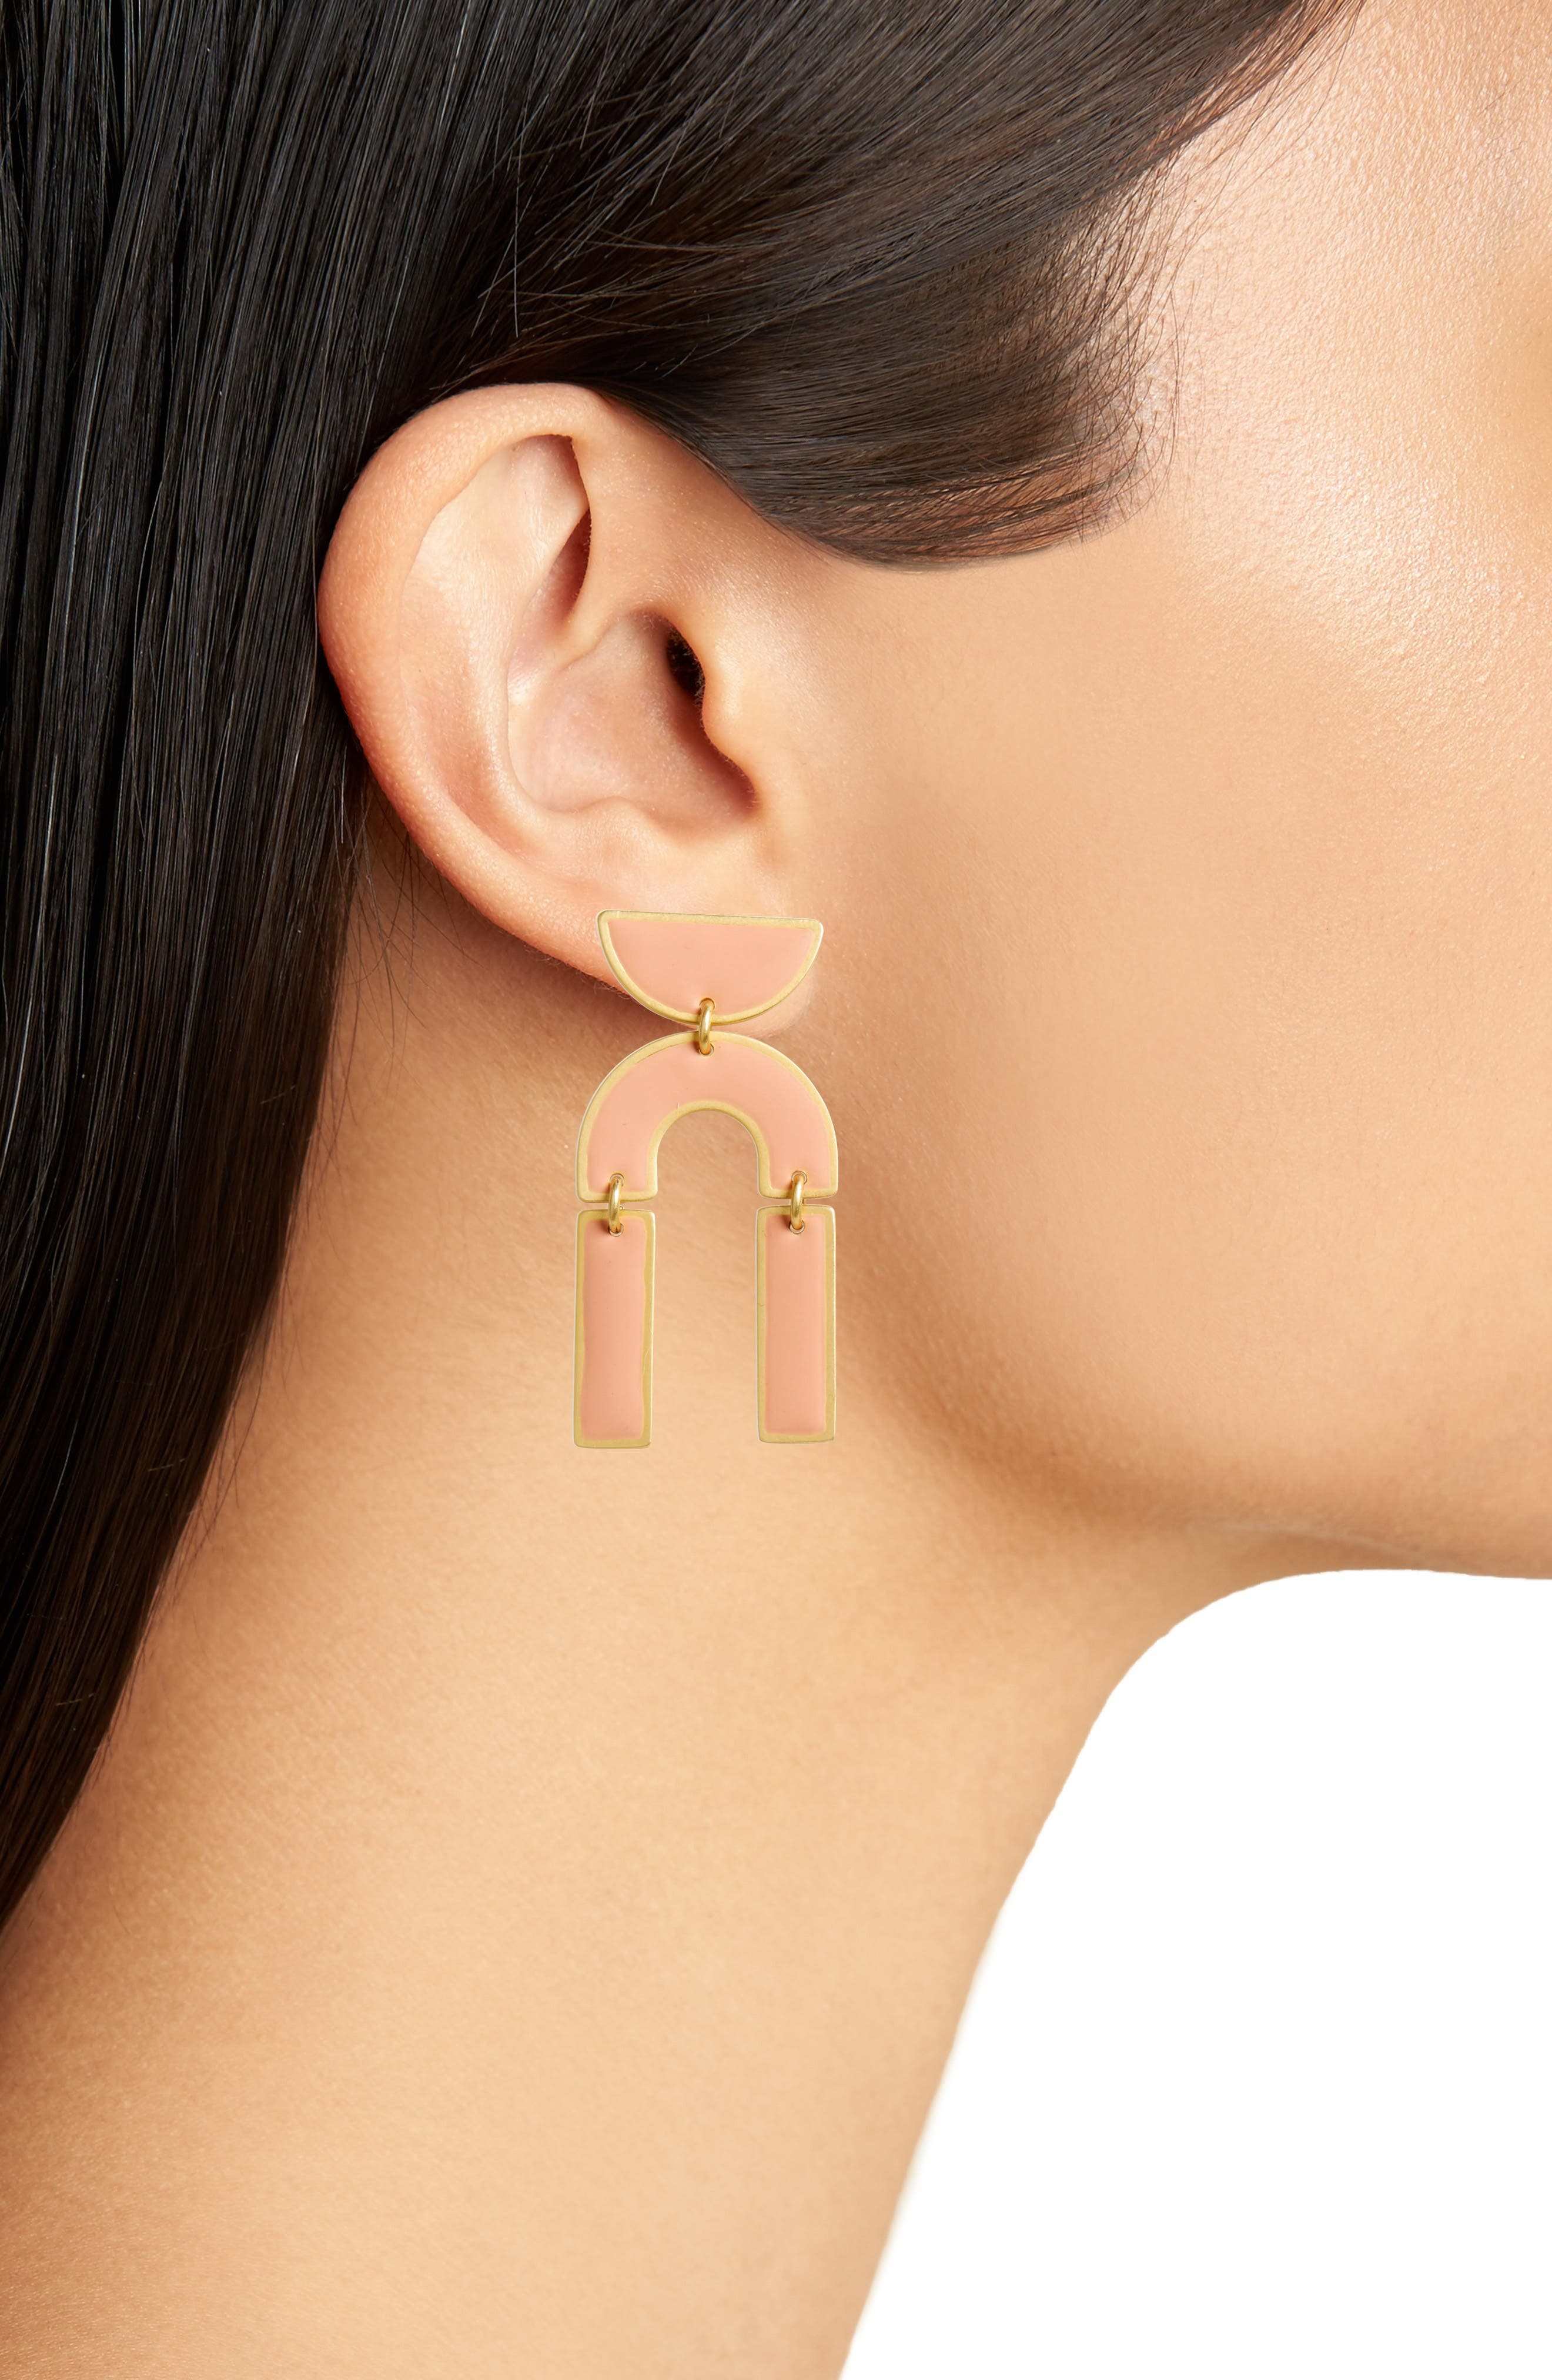 Modernism Half-Drop Earrings,                             Alternate thumbnail 2, color,